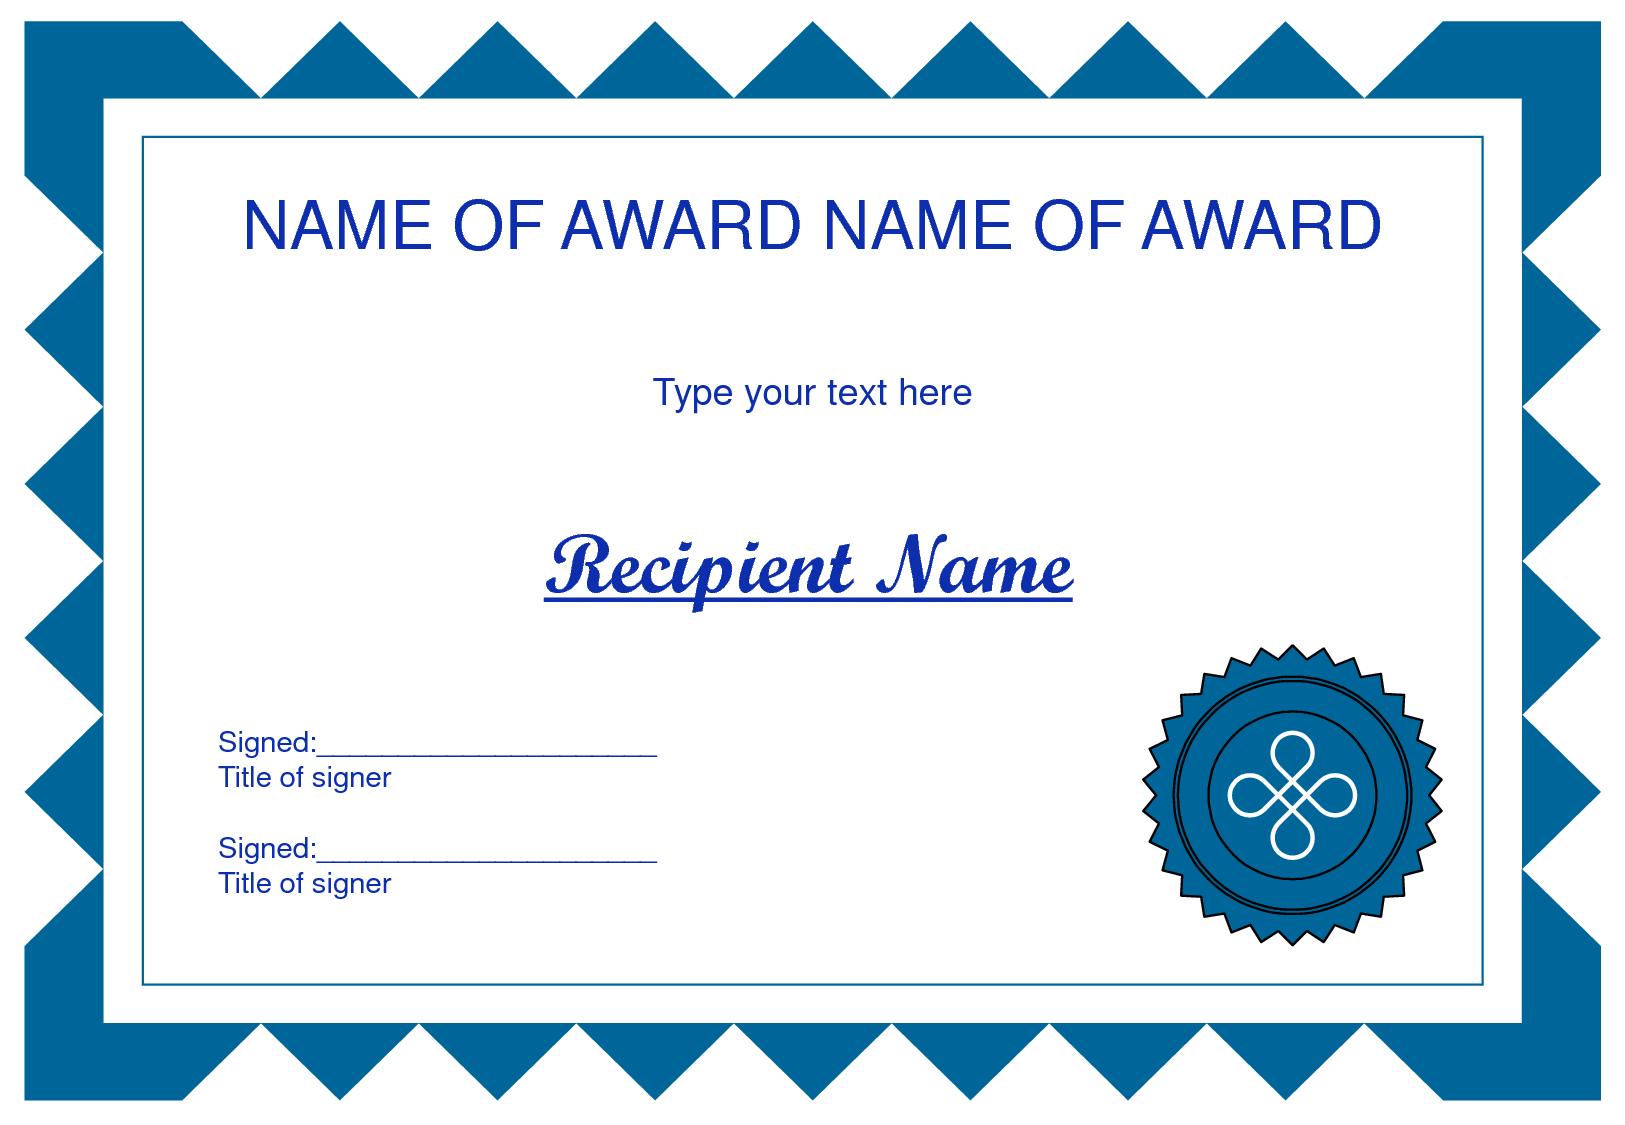 Free Award Cliparts, Download Free Clip Art, Free Clip Art.